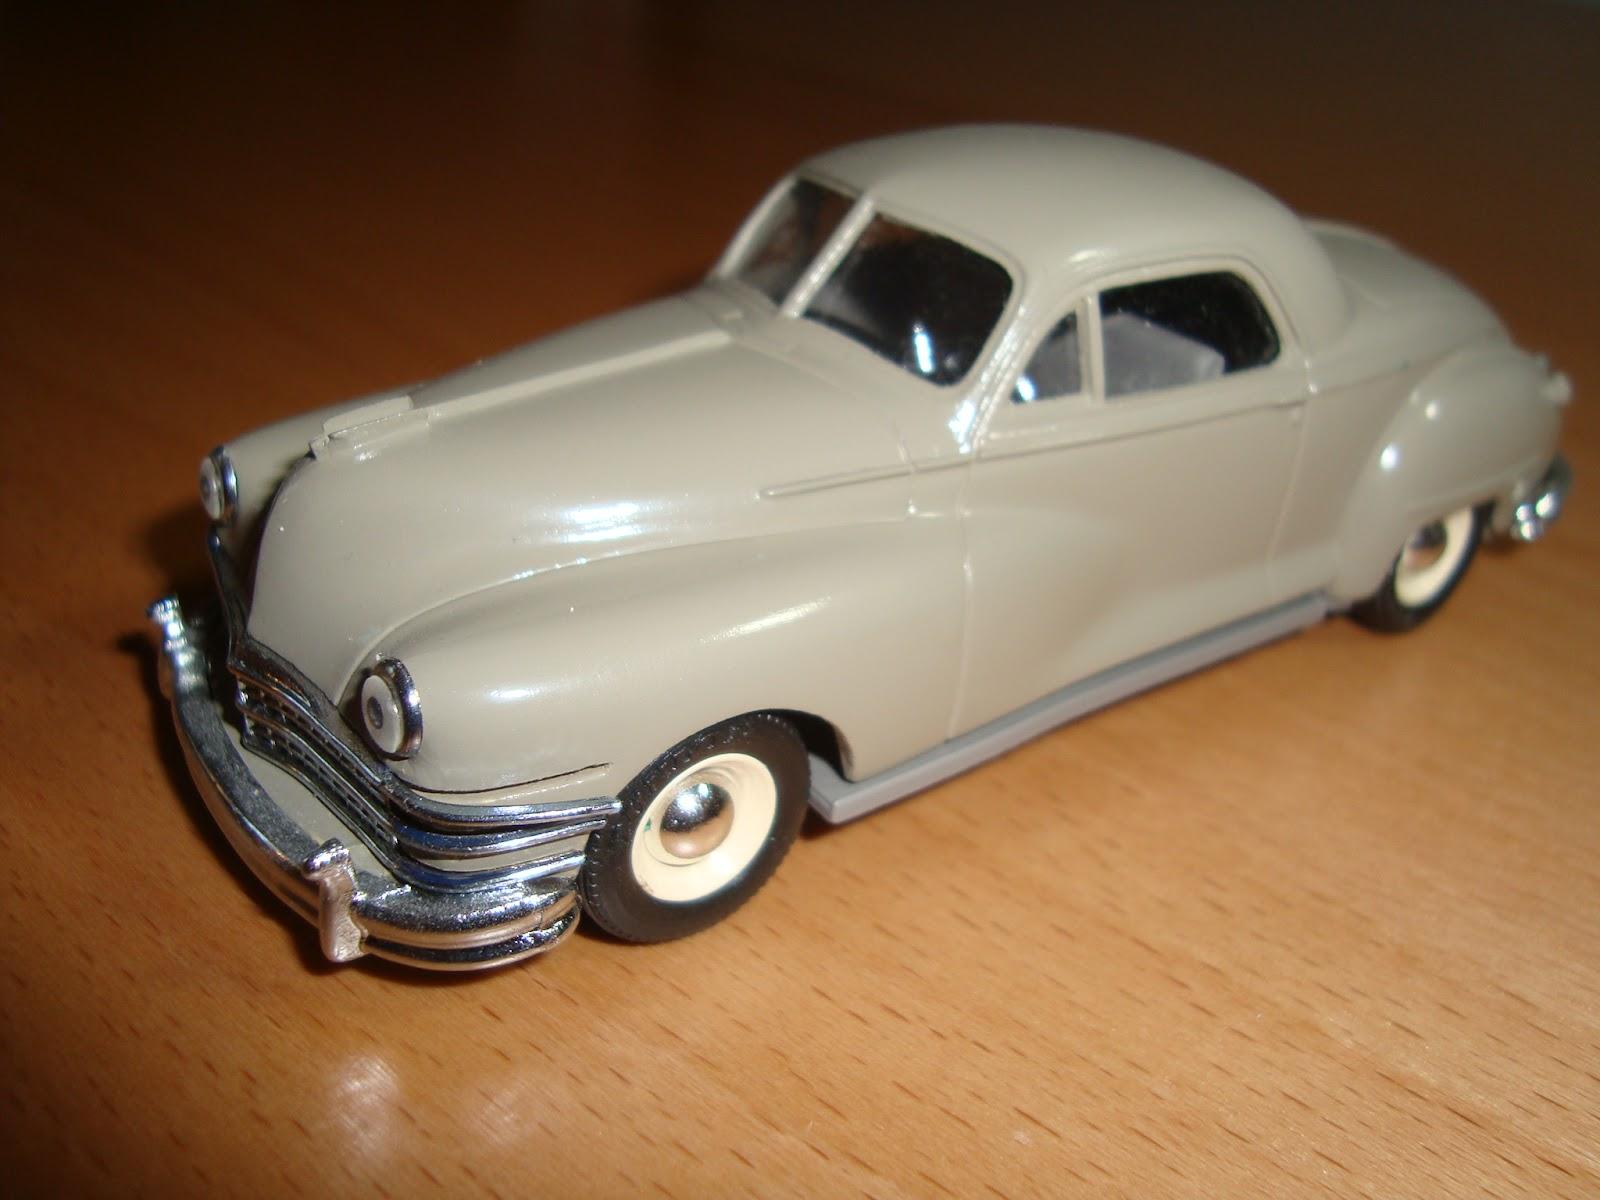 Oscar\'s Classic Model Cars Collection: 1947 Chrysler Windsor